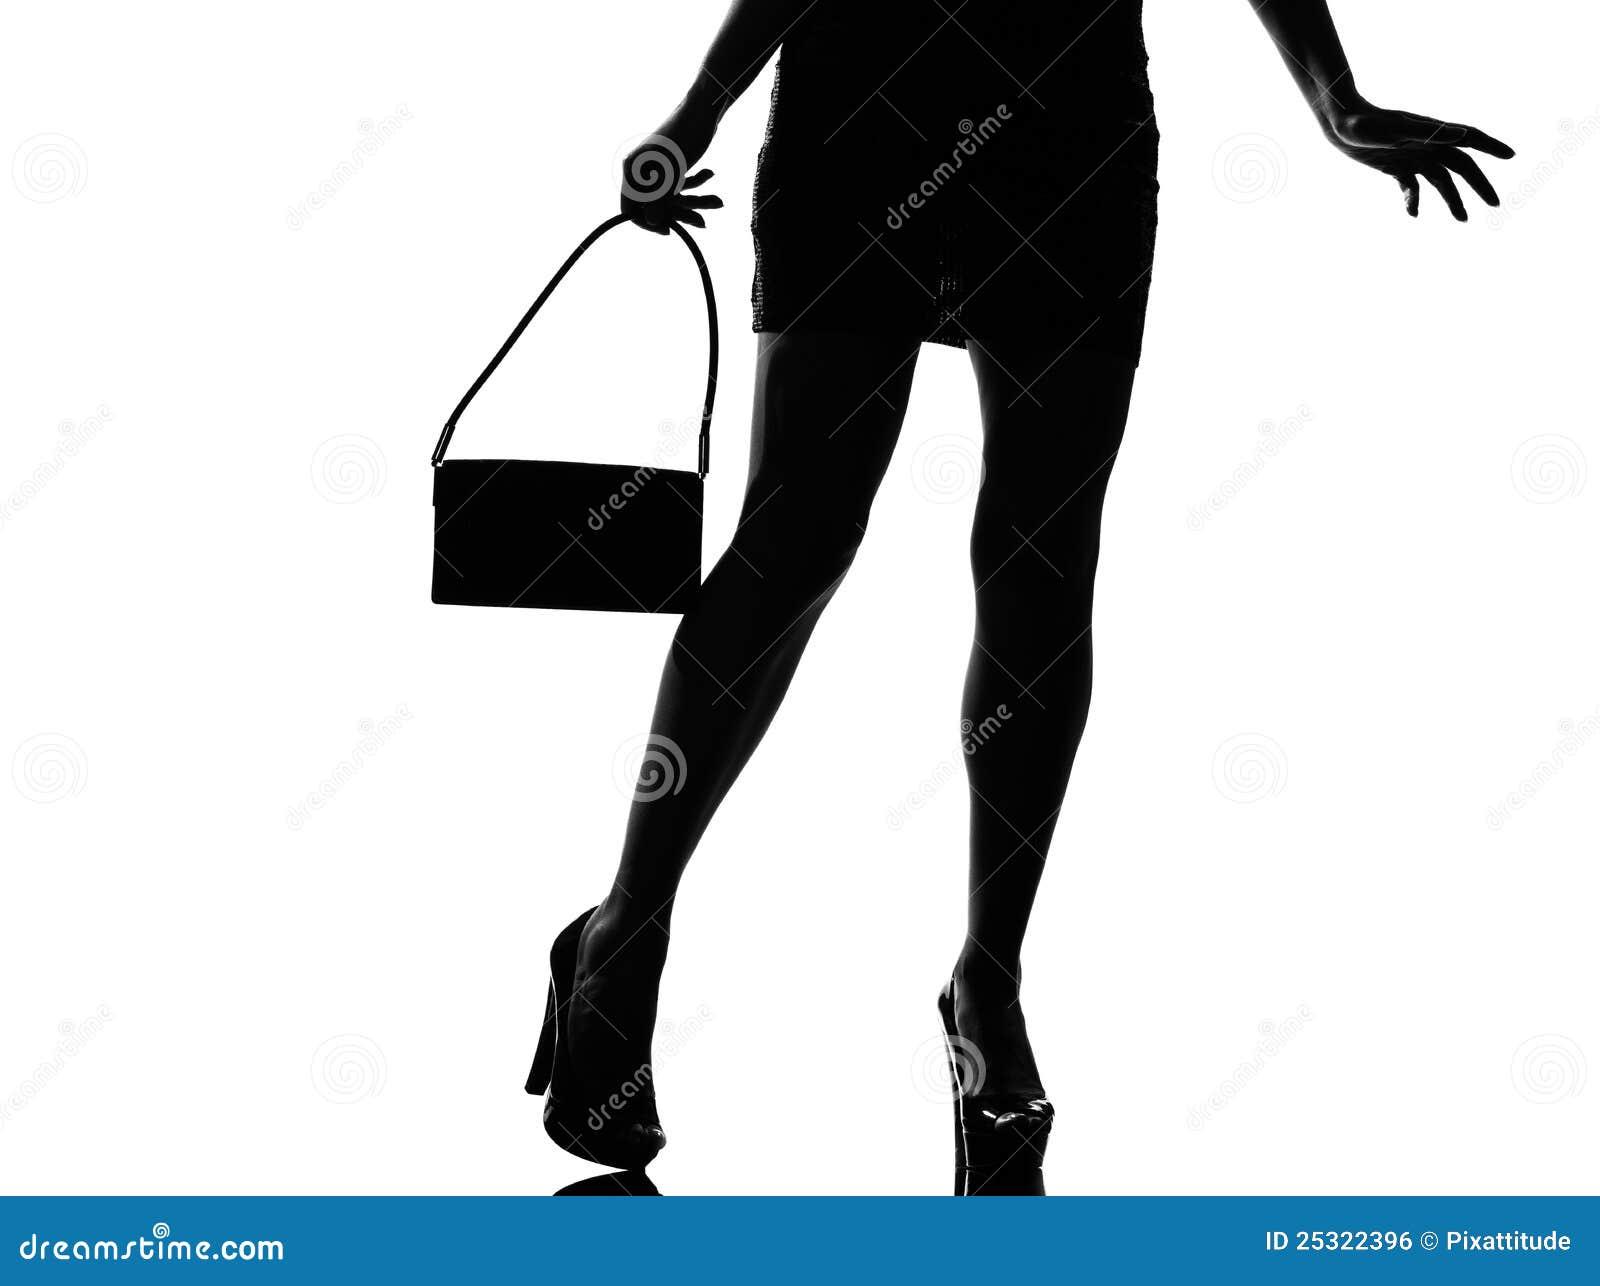 Stylish Silhouette Woman Legs Walking Royalty Free Stock ...